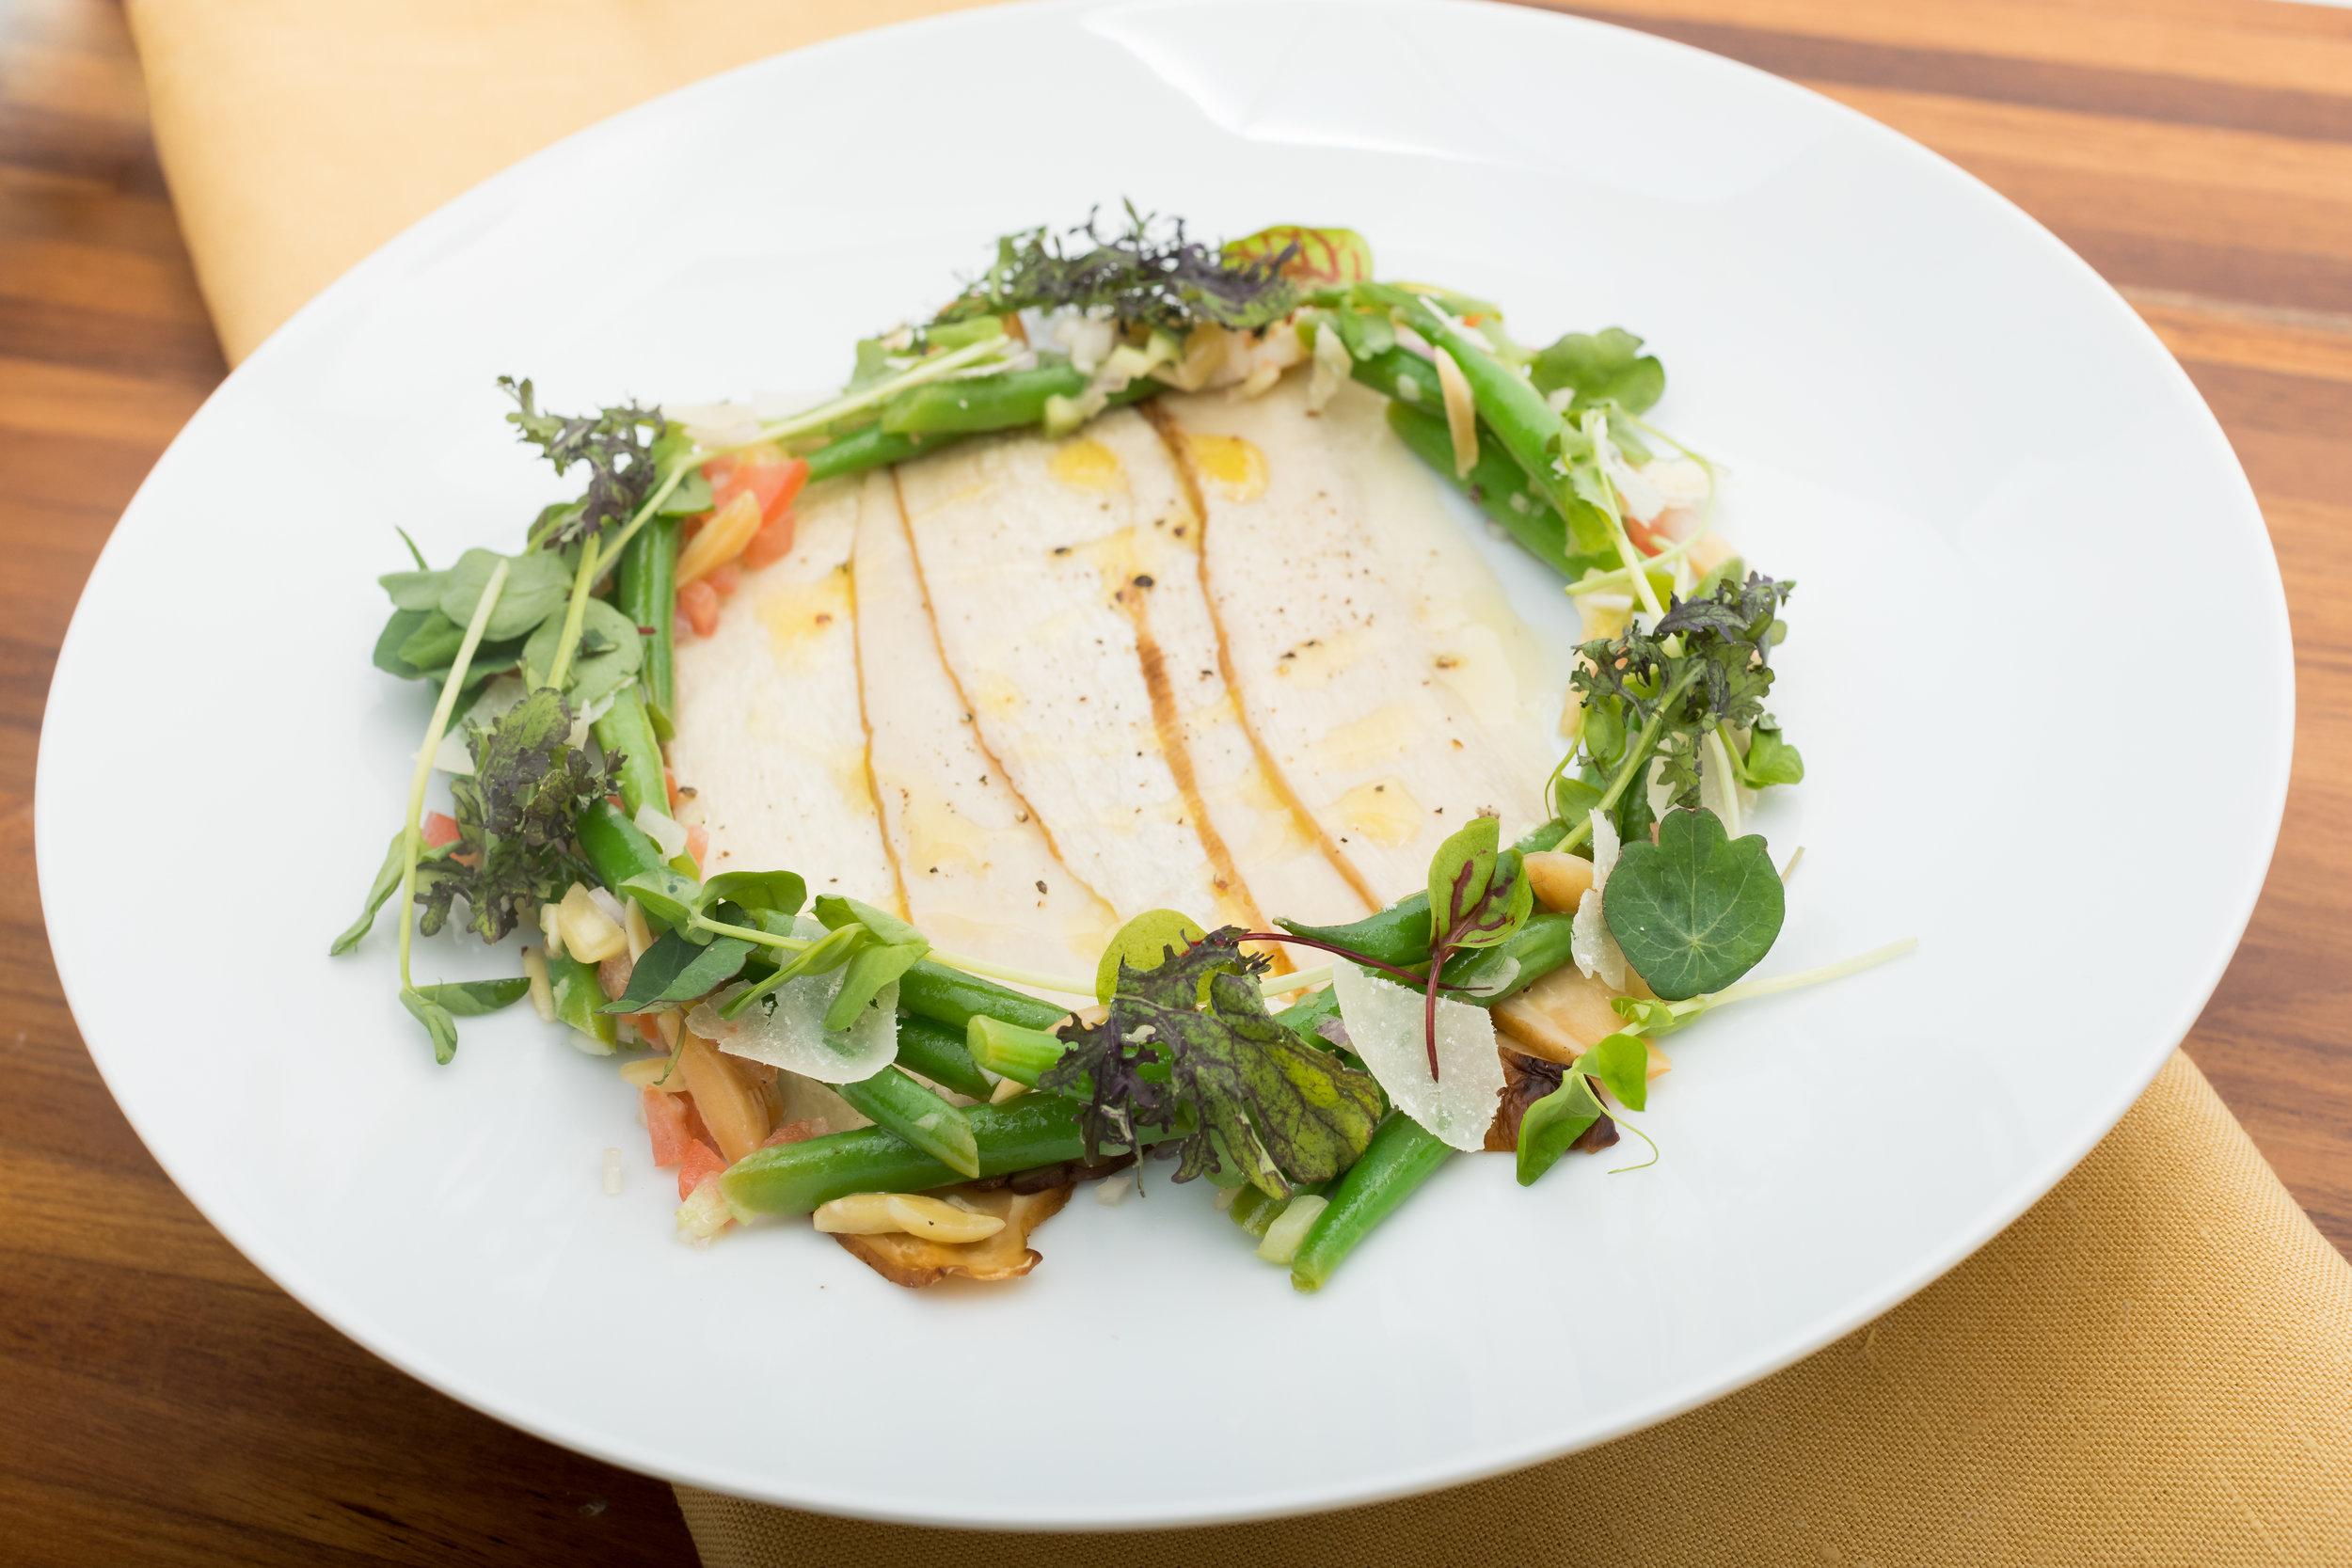 King Trumpet Oyster Mushroom Carpaccio w_Parmesan, Herb Salad, Almonds, Lemon_Amanda Gentile5.jpg